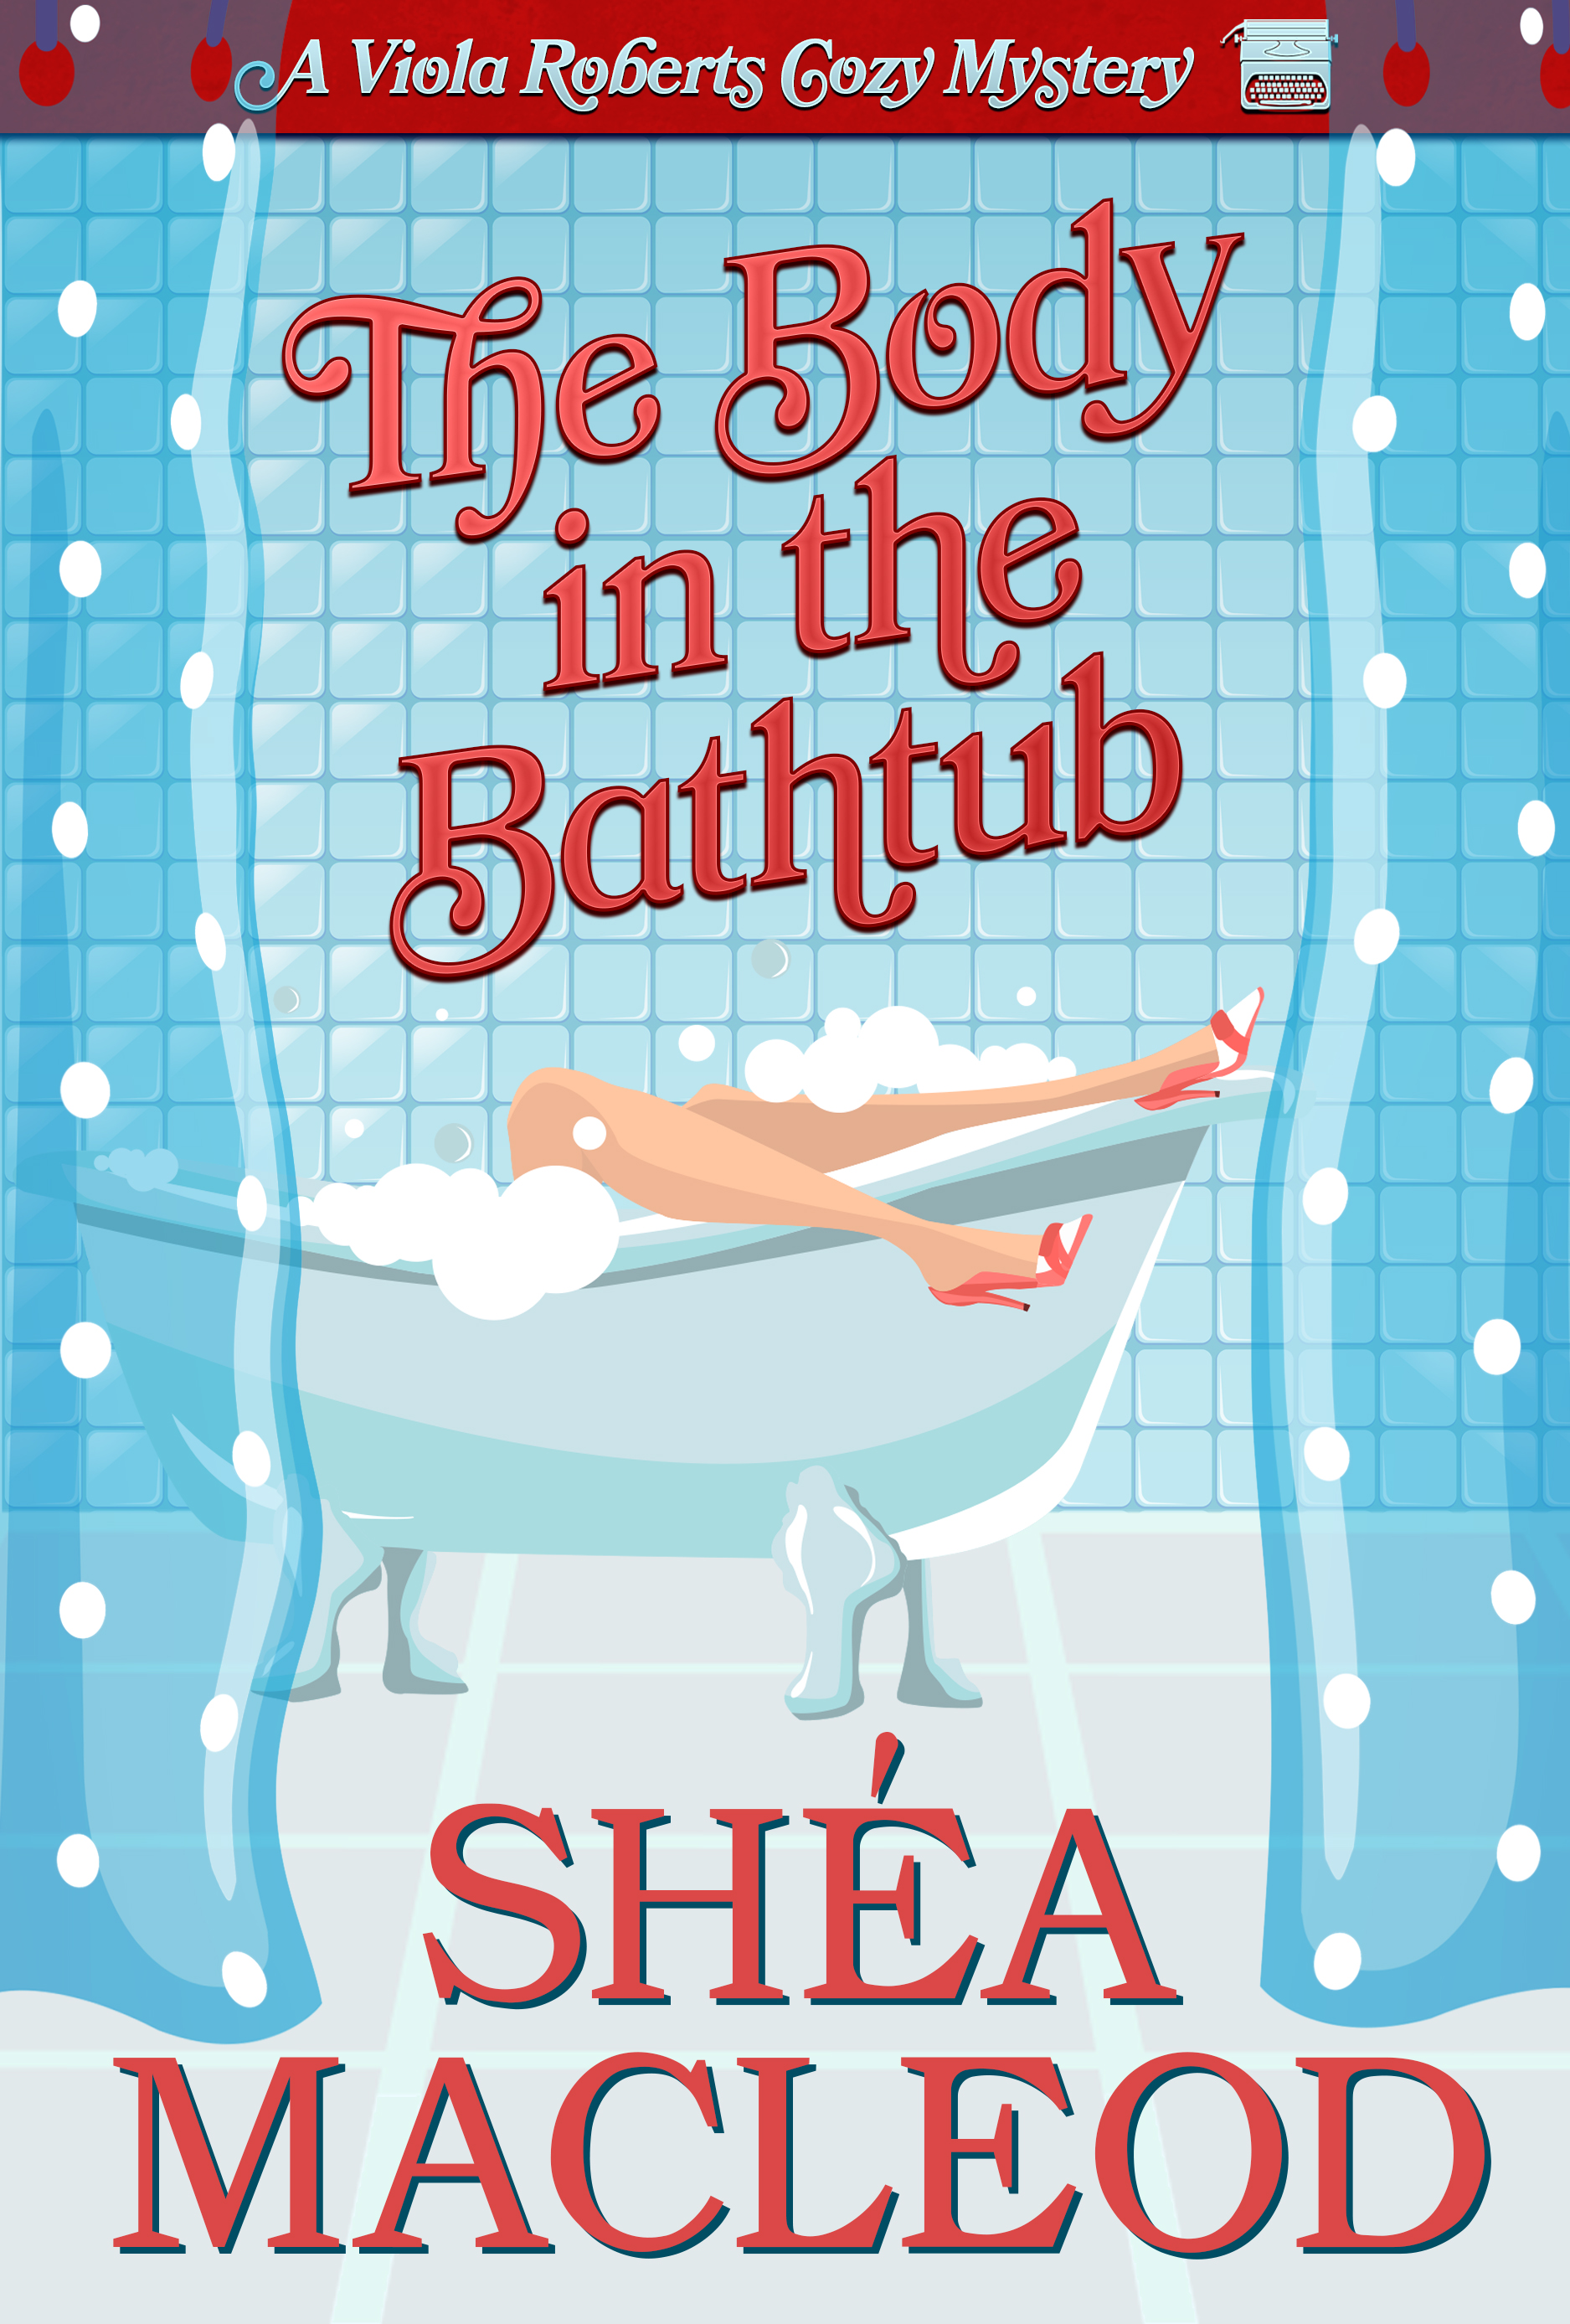 The Body in the Bathtub